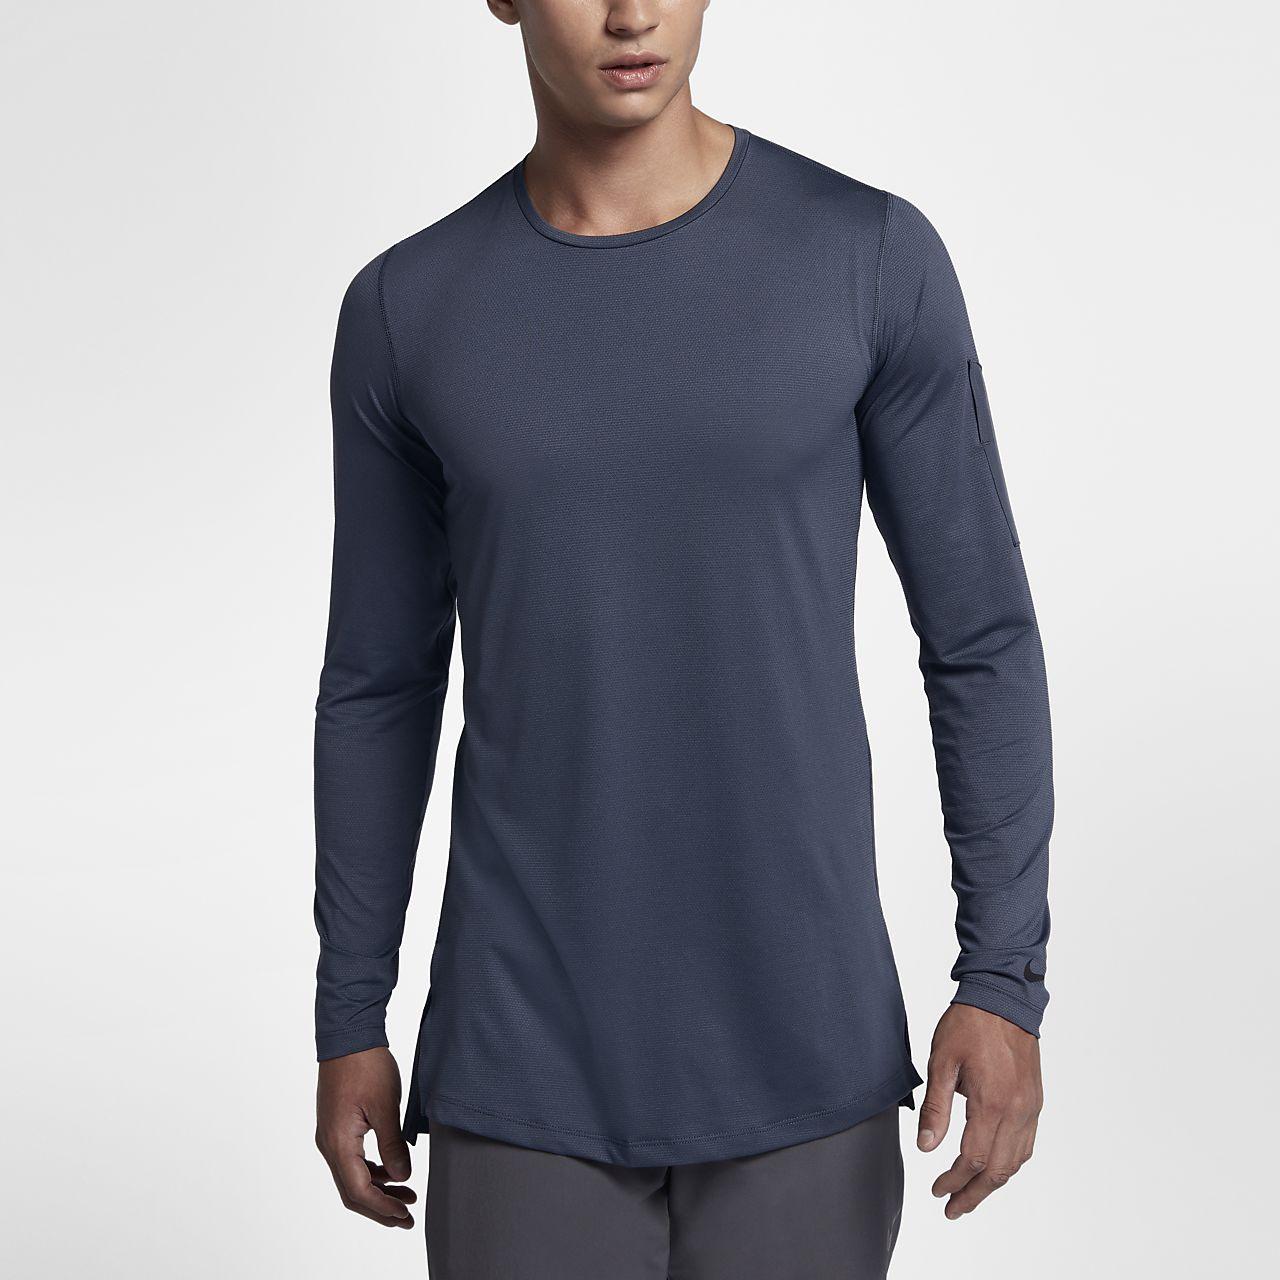 f284b93c75 Mens Nike Dri Fit Shirts Long Sleeve | Lixnet AG